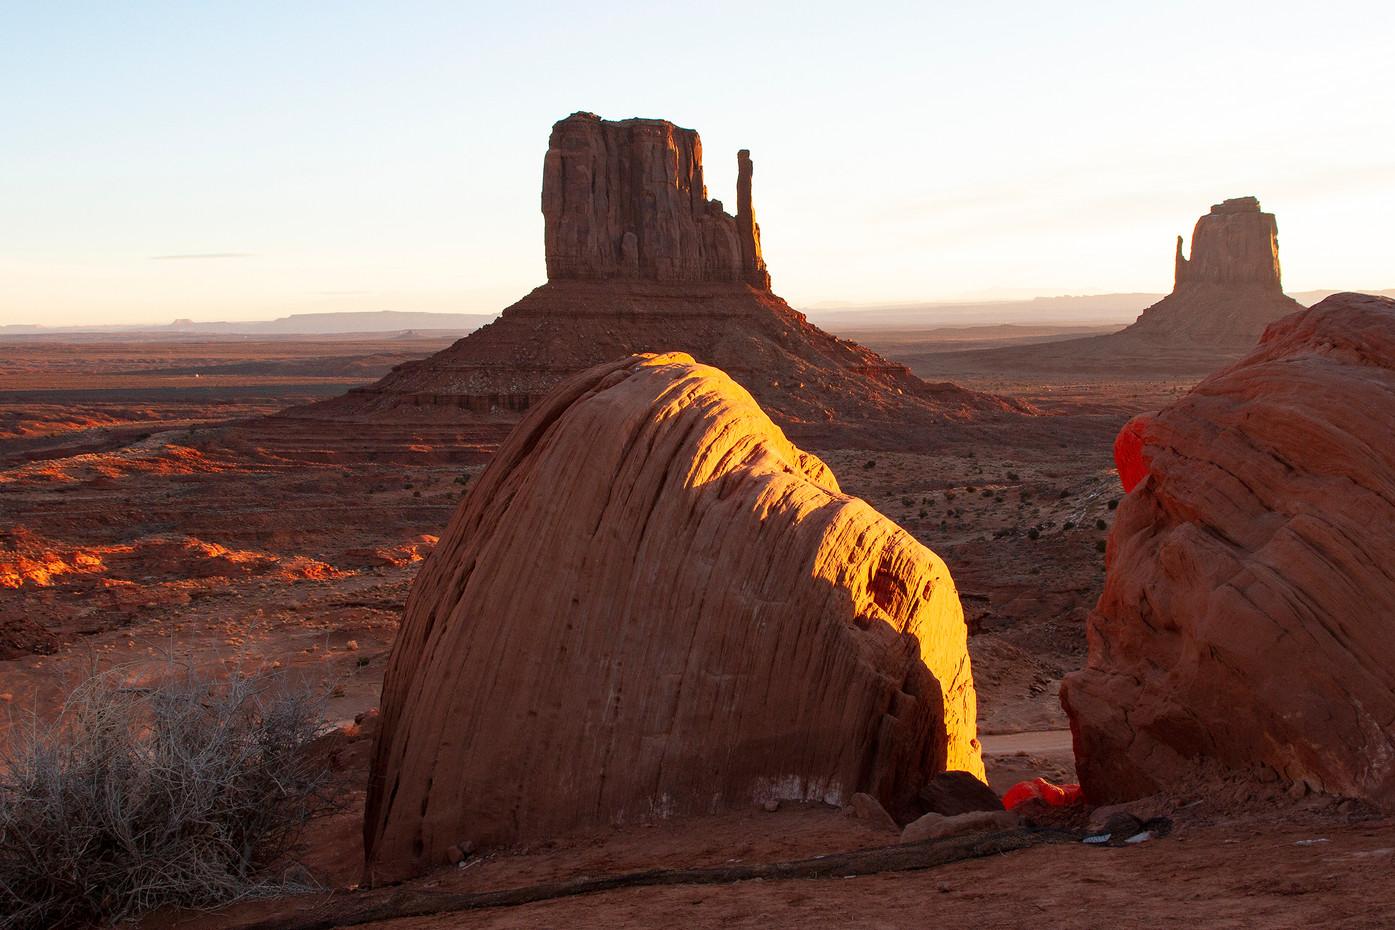 Monument Valley from Arizona, USA